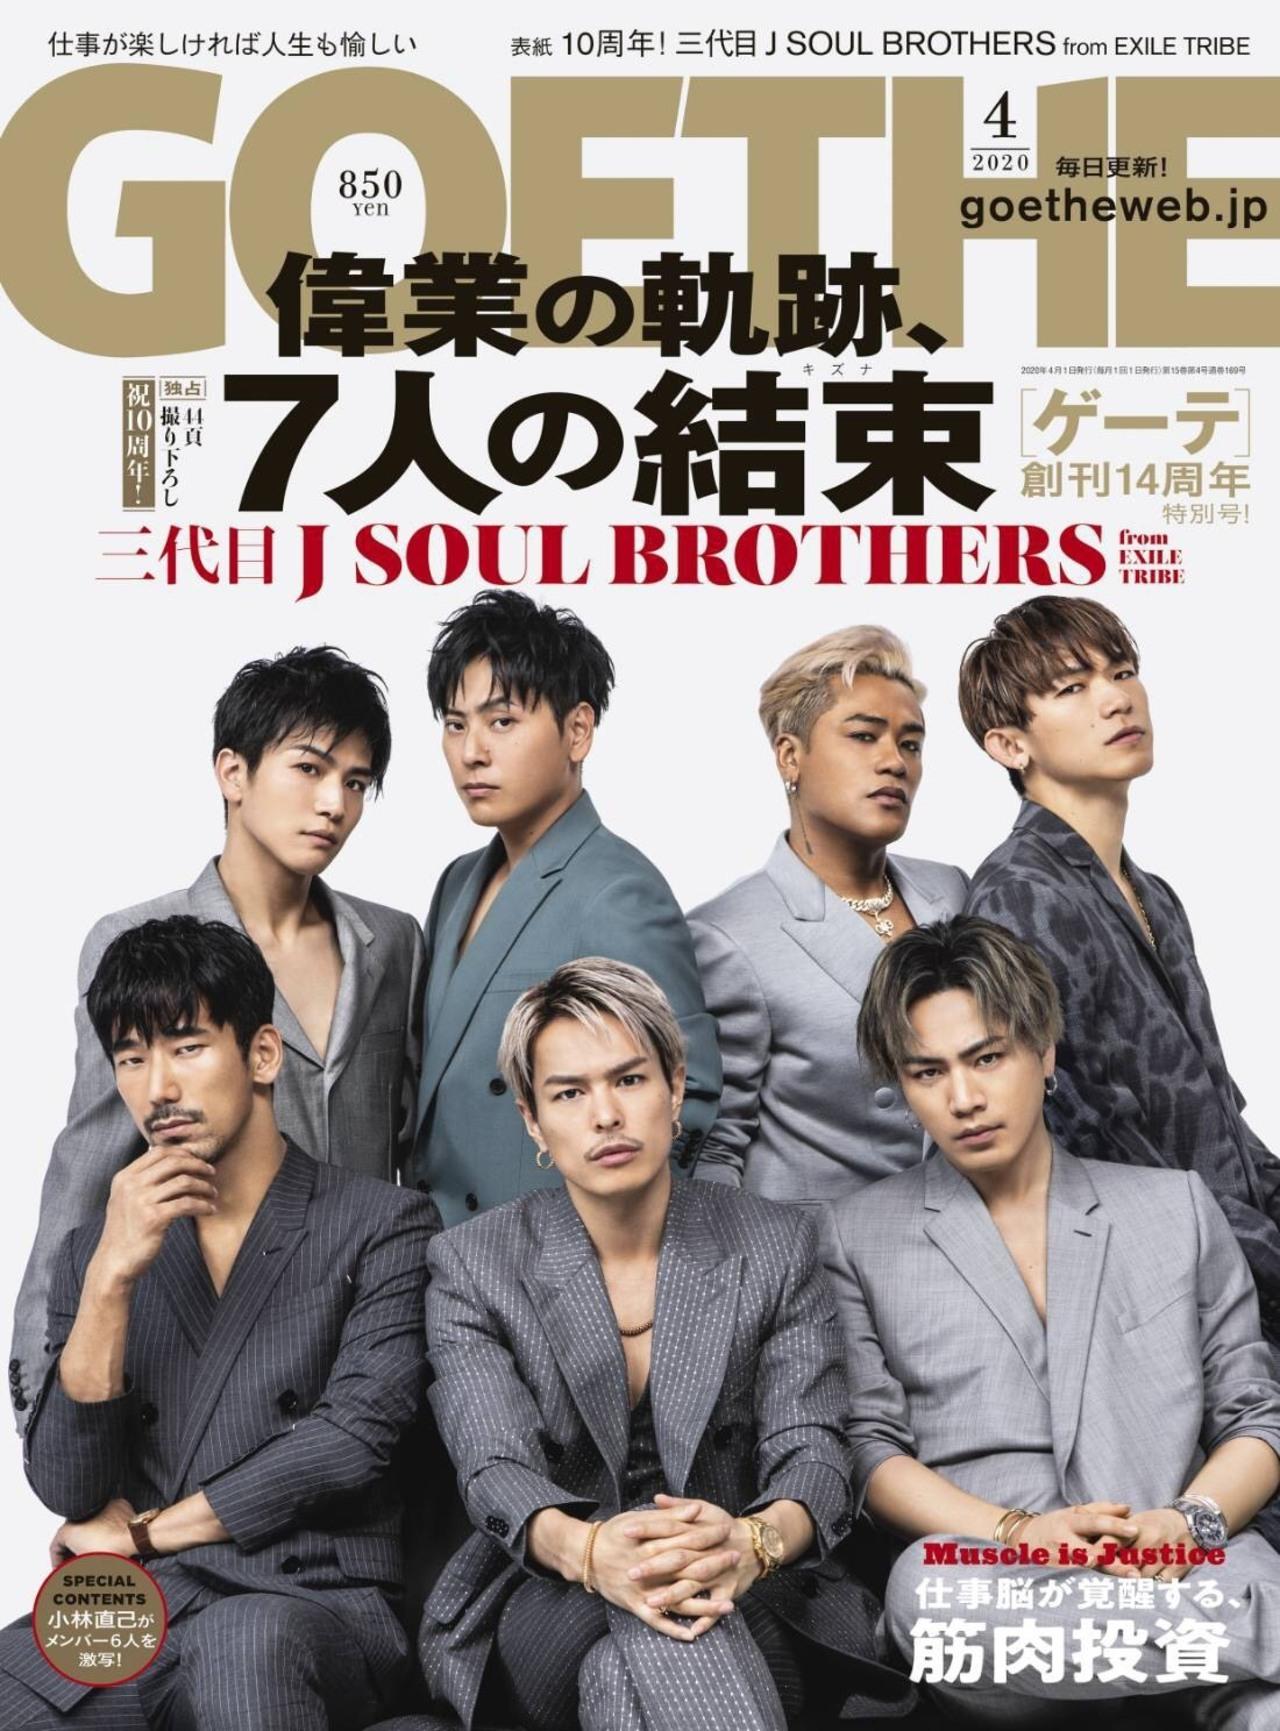 J brothers 三代目 soul